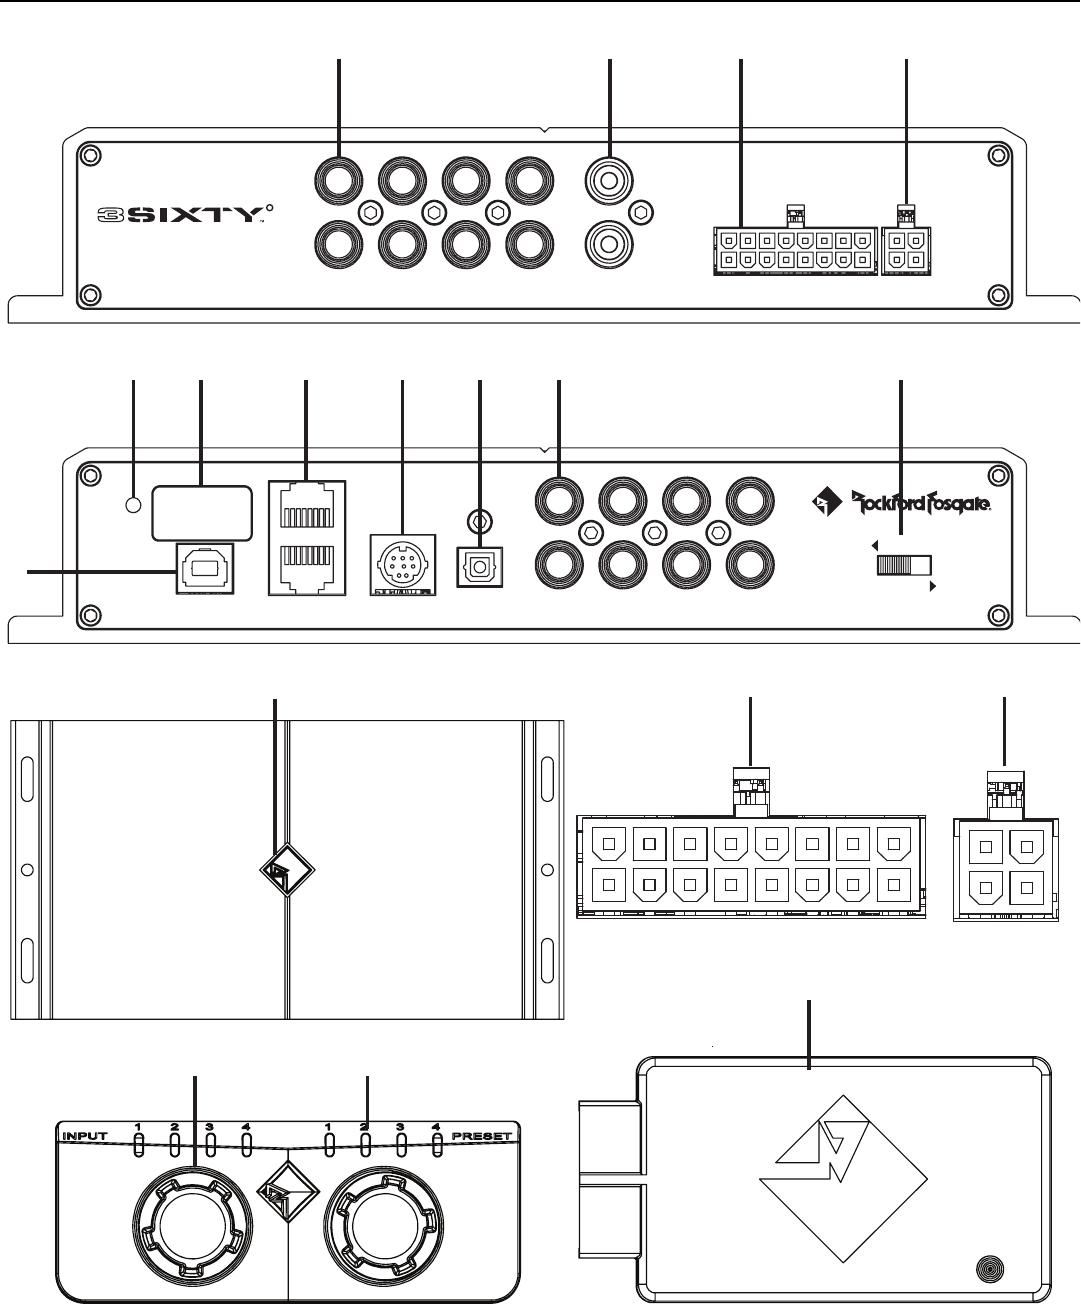 DIAGRAM] Wiring Diagrams Rockford Fosgate 3sixty 3 FULL Version HD Quality 3sixty  3 - TJJDATABASE.K-DANSE.FRK-danse.fr